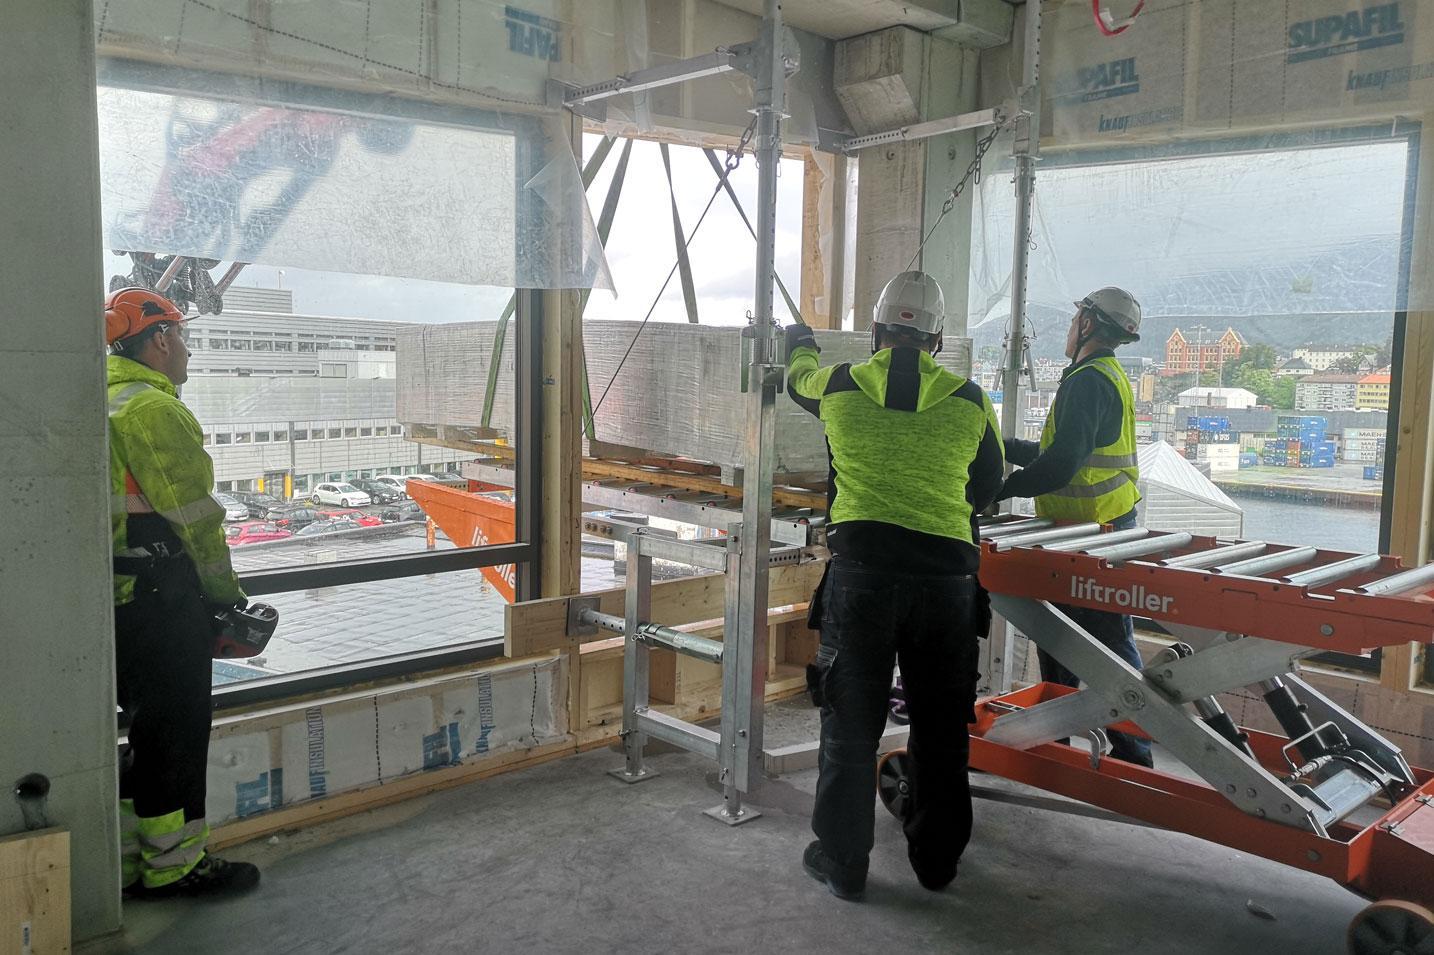 Inntransport på Liftroller Wall på nybygget Kilen i Bergen